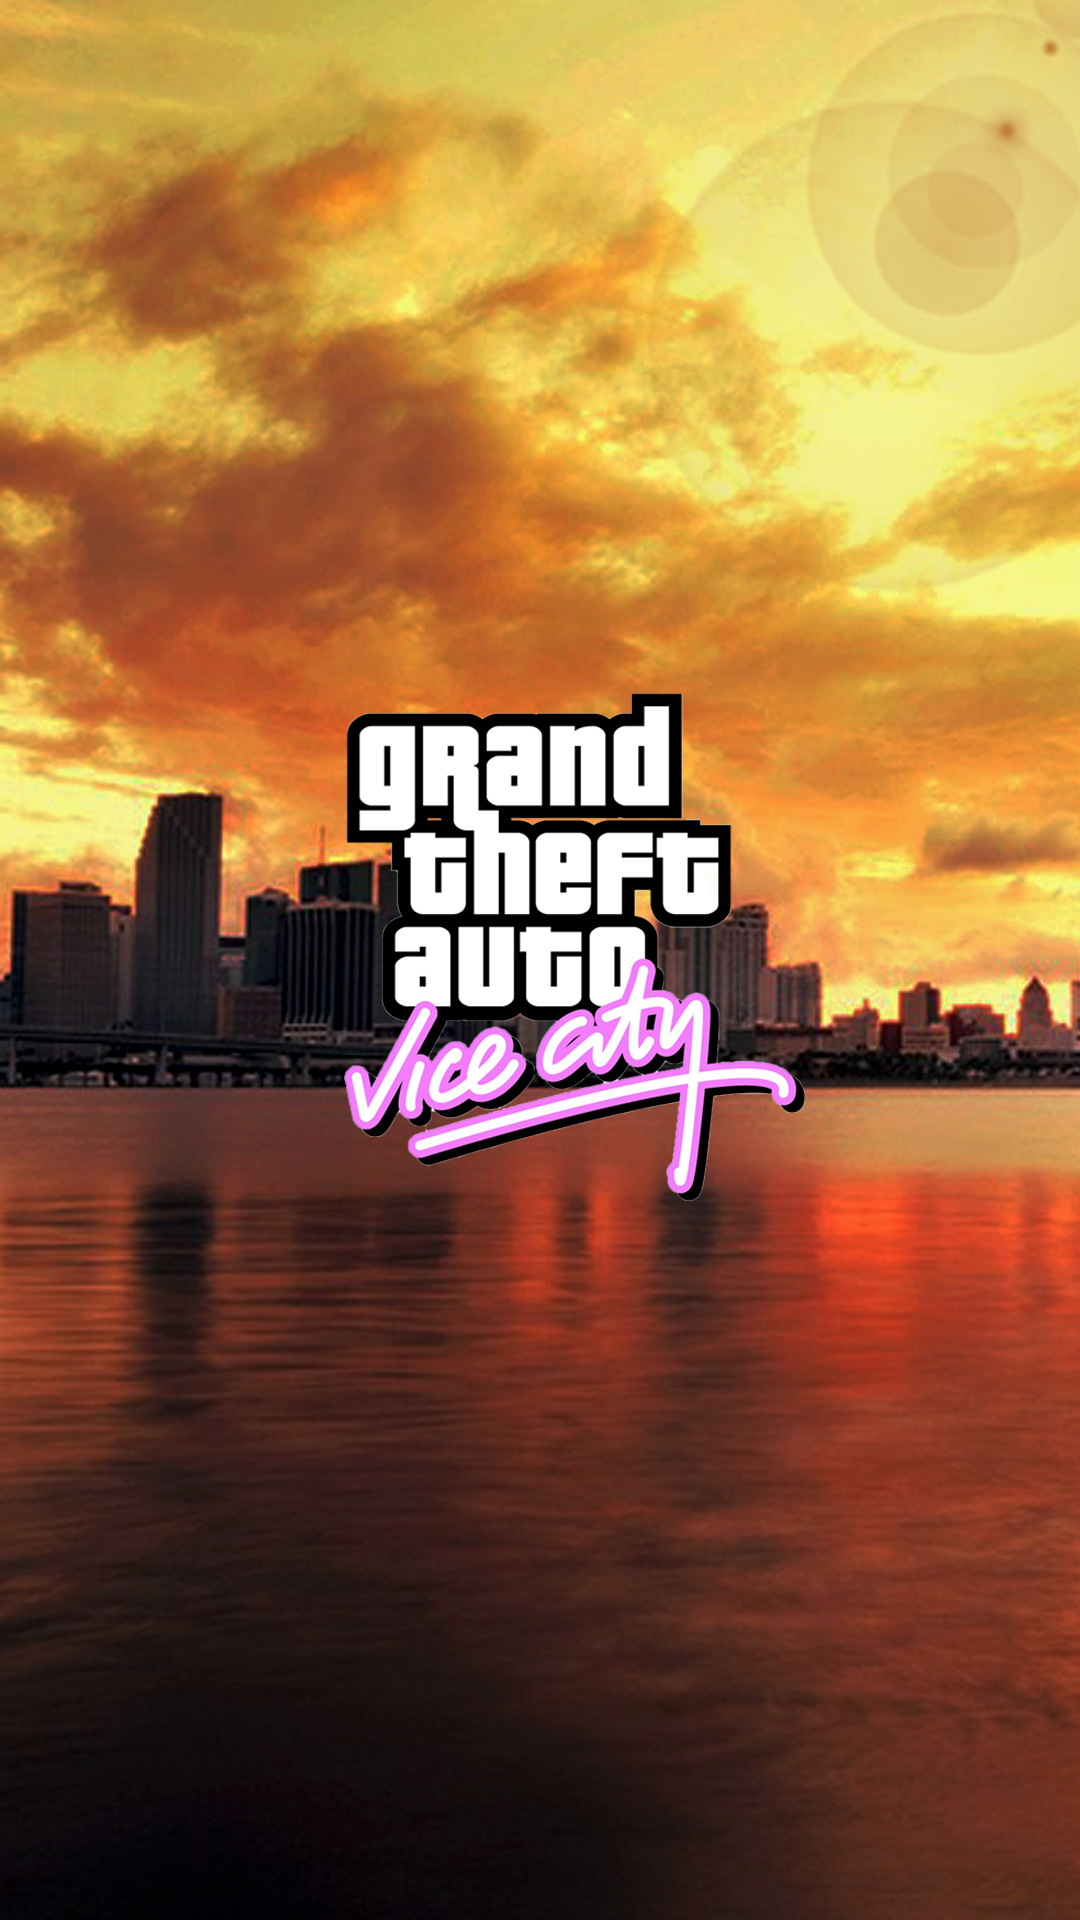 Gta Vice City Wallpapers Top Free Gta Vice City